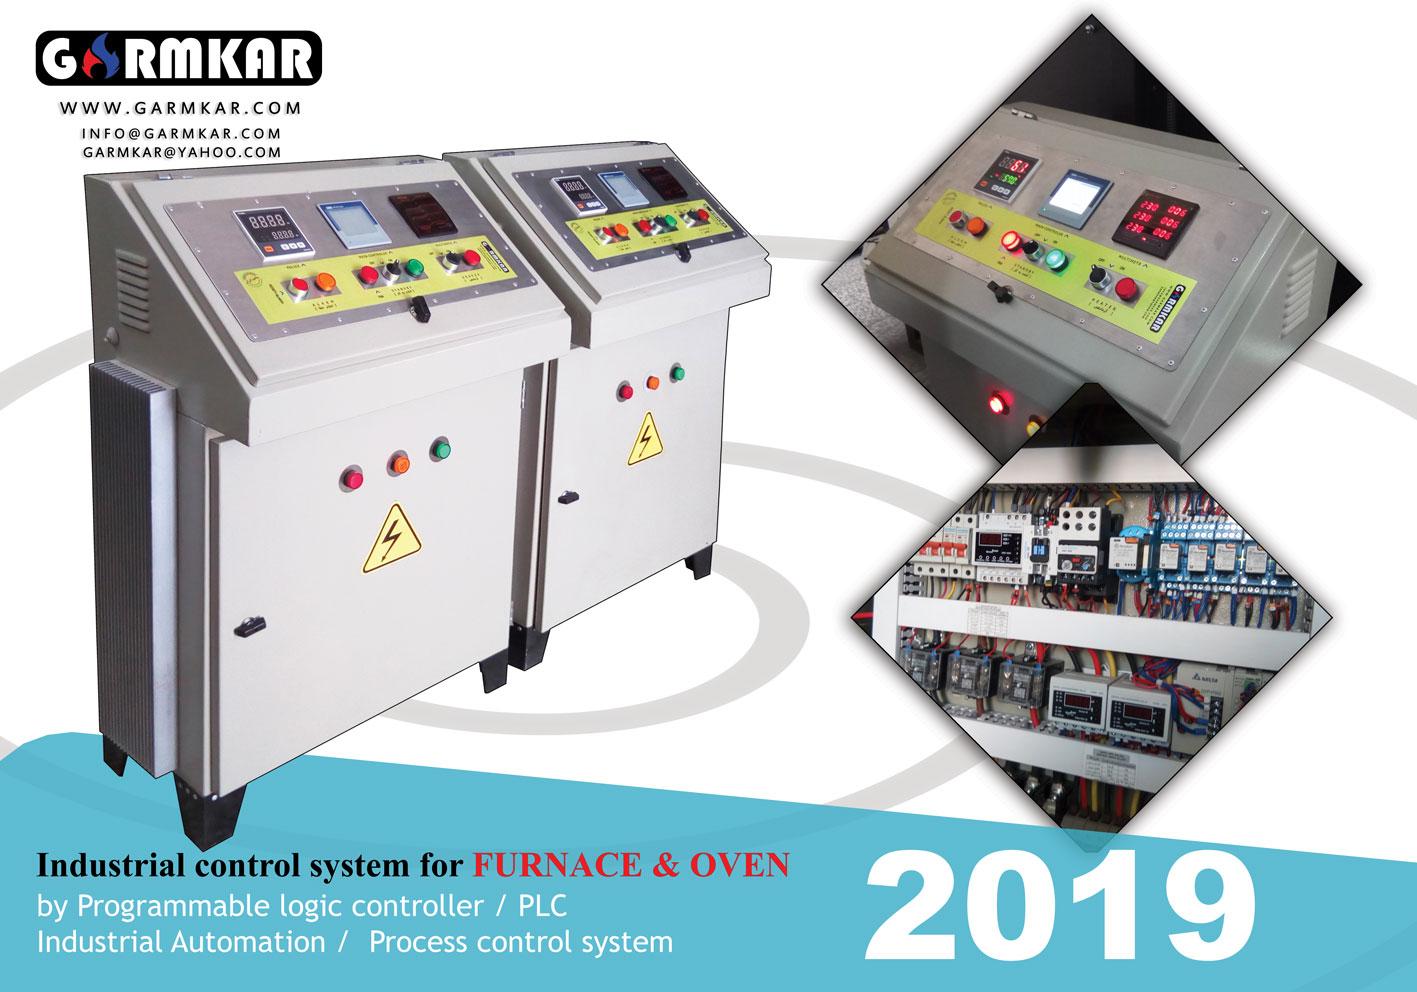 garmkar-furnace-oven-تابلو-برق-کوره-های-صنعتی-کوره-ساز-.jpg